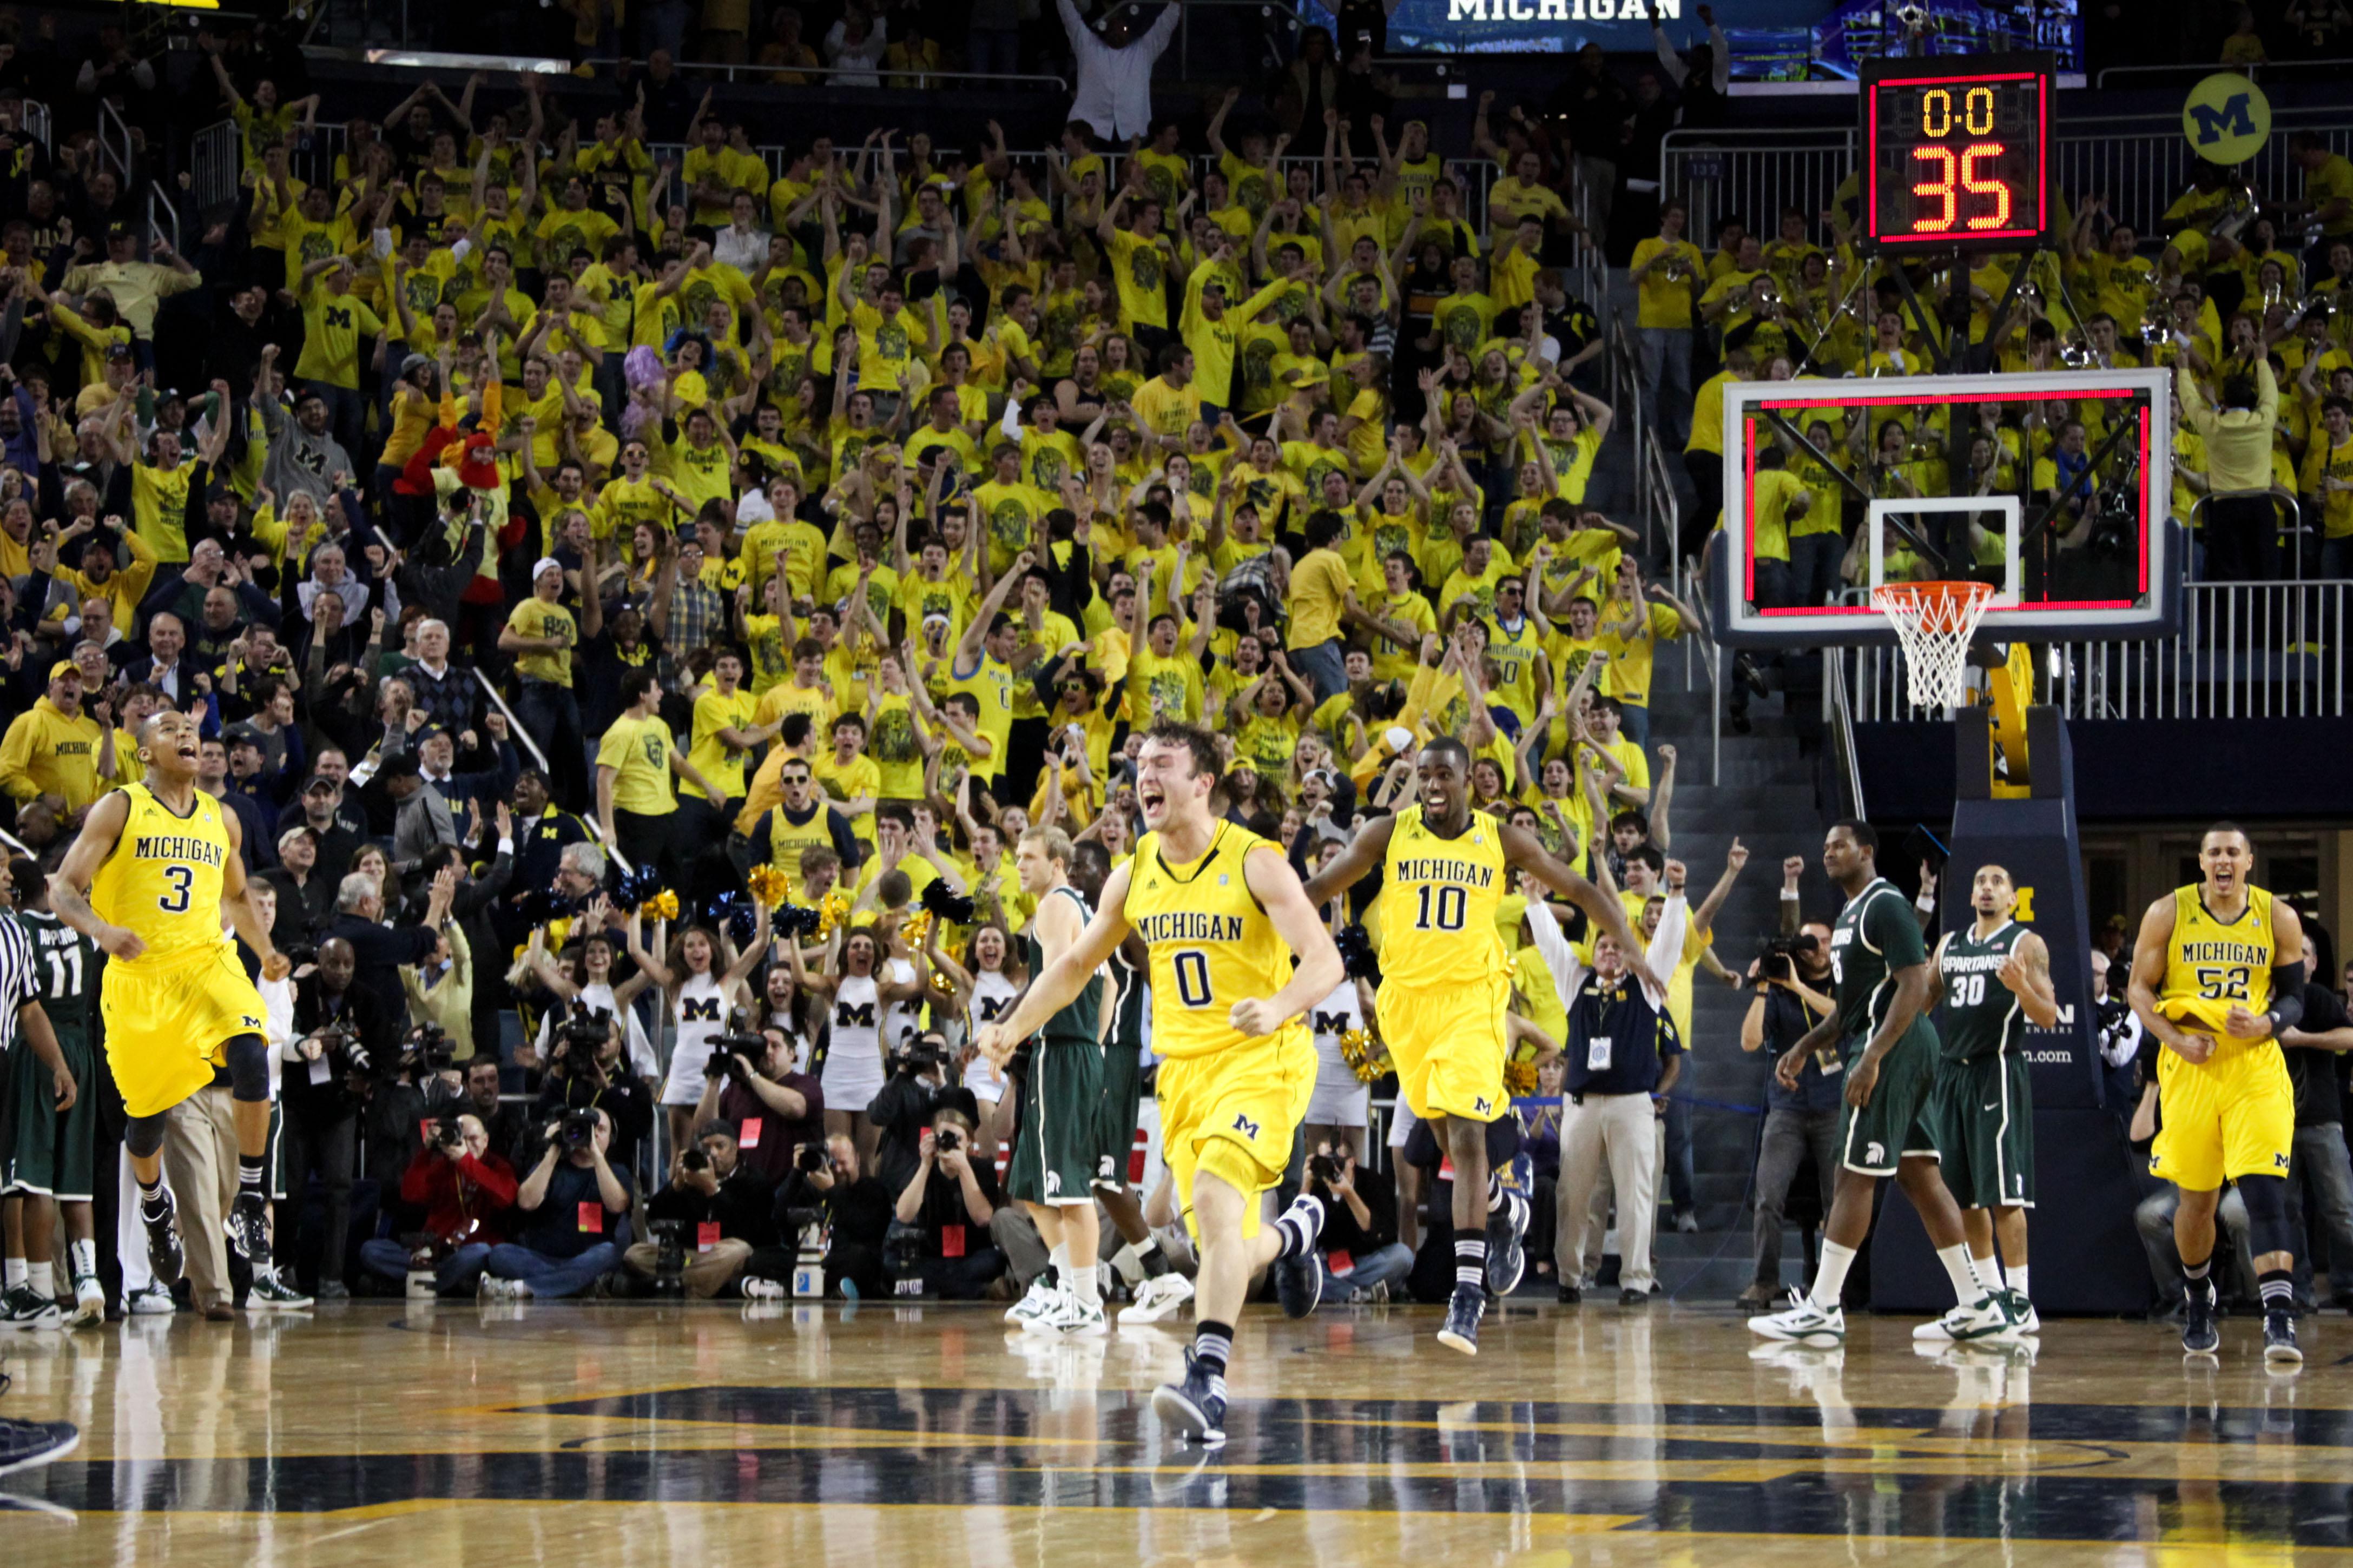 Michigan State at Michigan 31